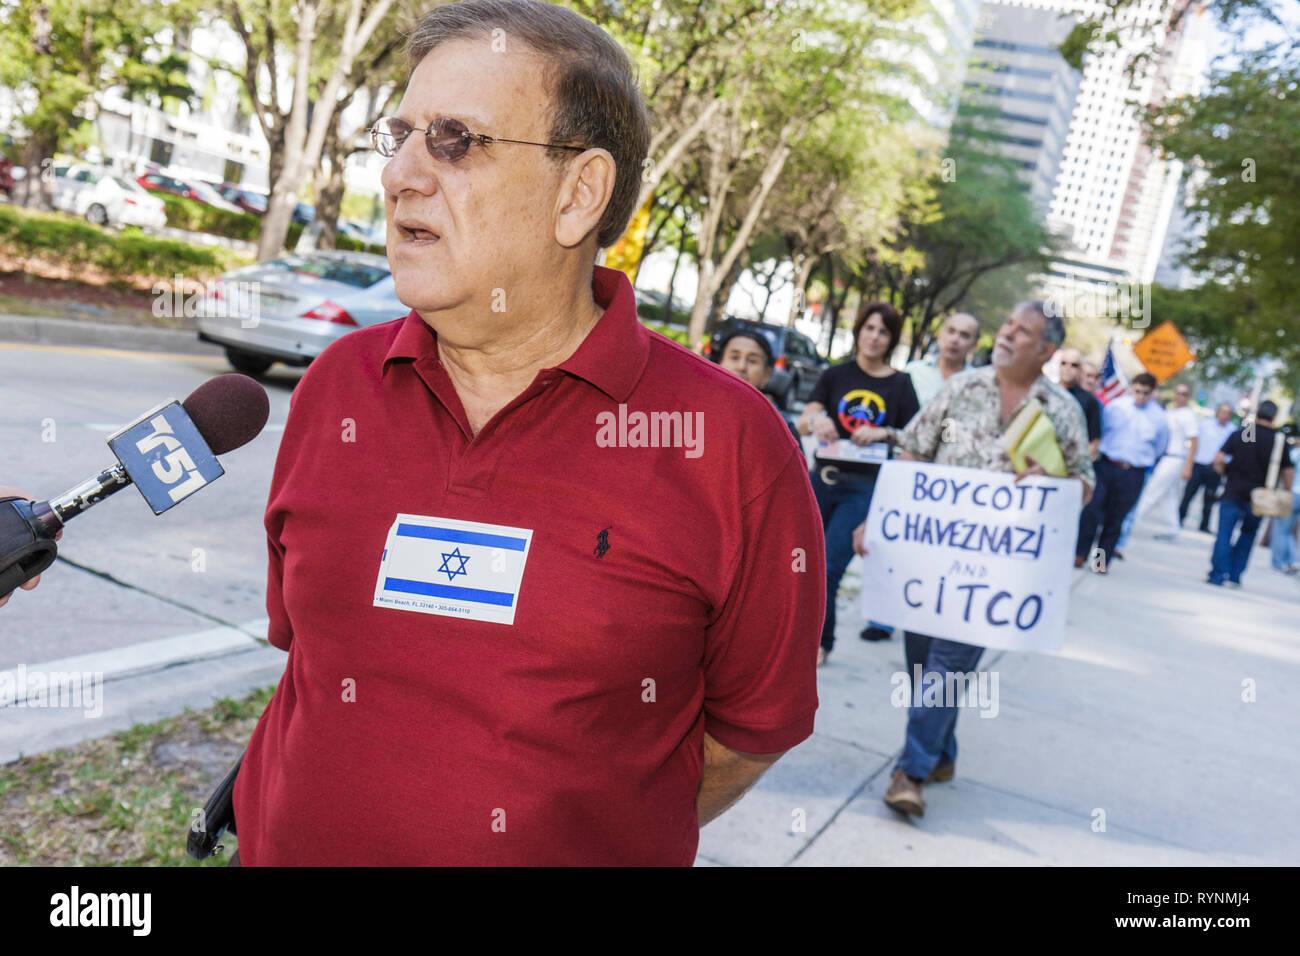 Miami Florida Brickell Avenue Venezuelan Consulate rally protest Caracas synagogue attack anti Semitism Jew Jews President Hugo - Stock Image